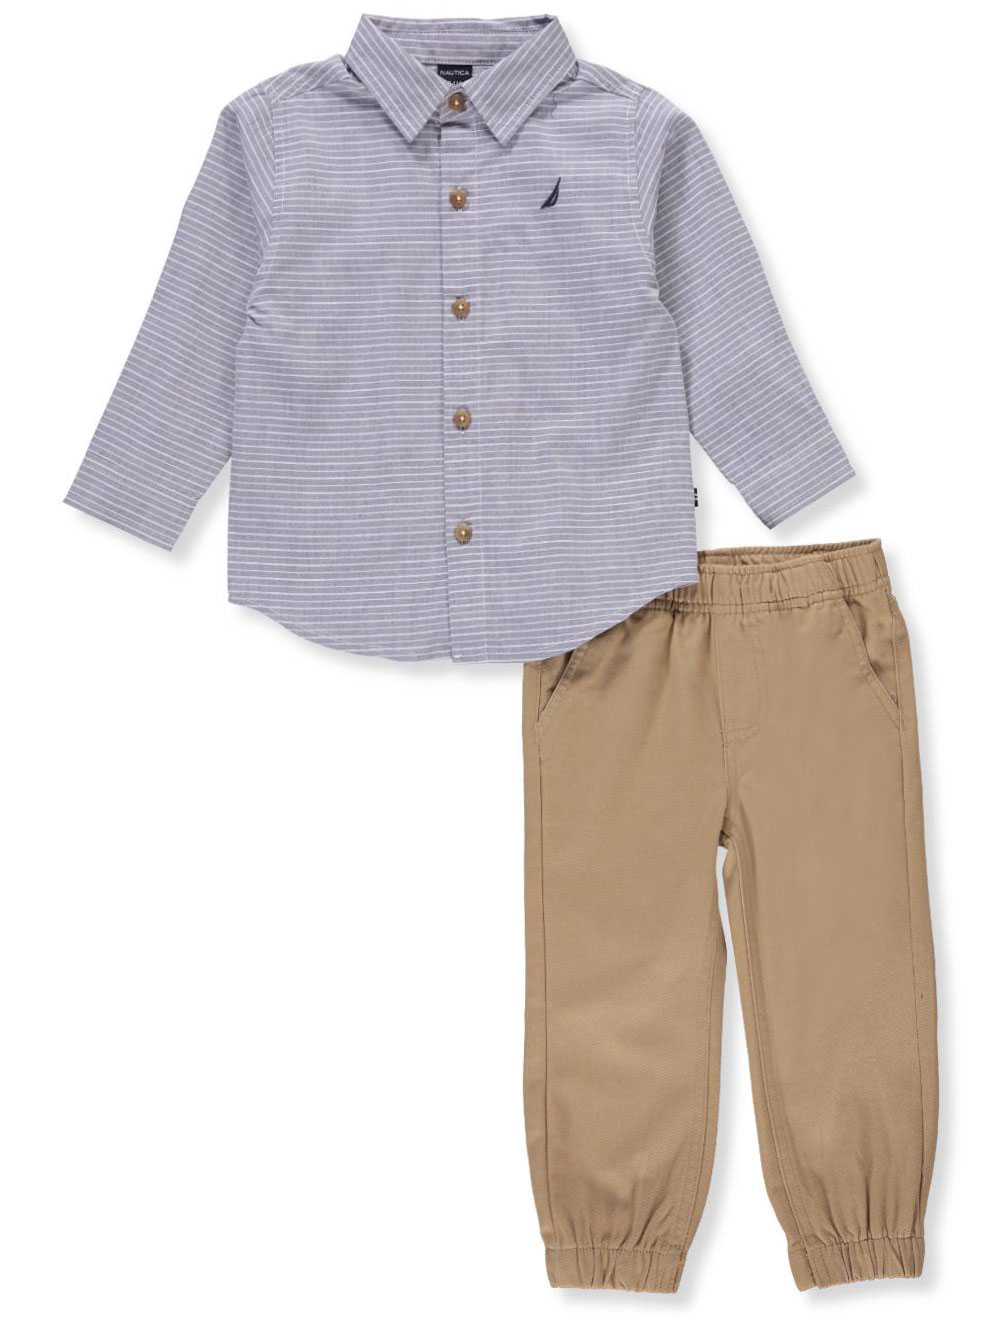 7b1a268de Nautica Baby Boys' 2-Piece Pants Set Outfit